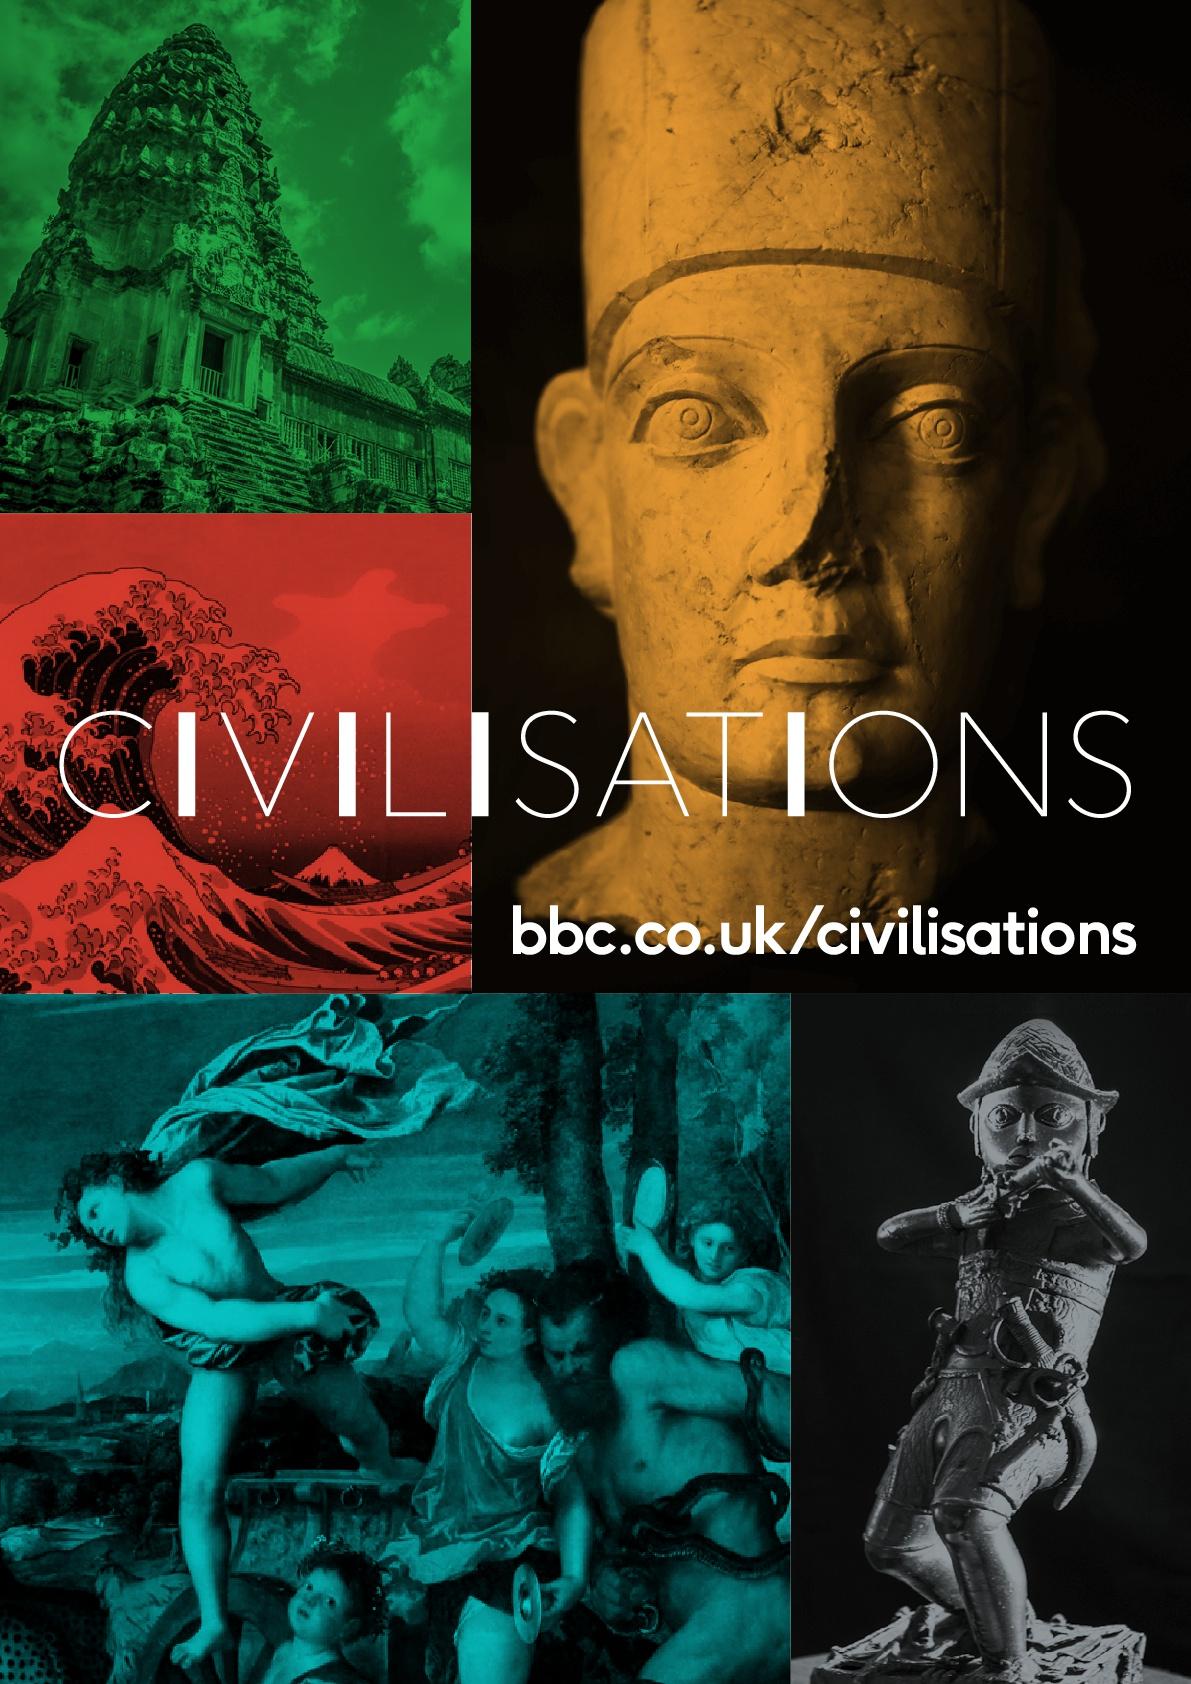 BBC Civilisations A4 Poster -001.jpg